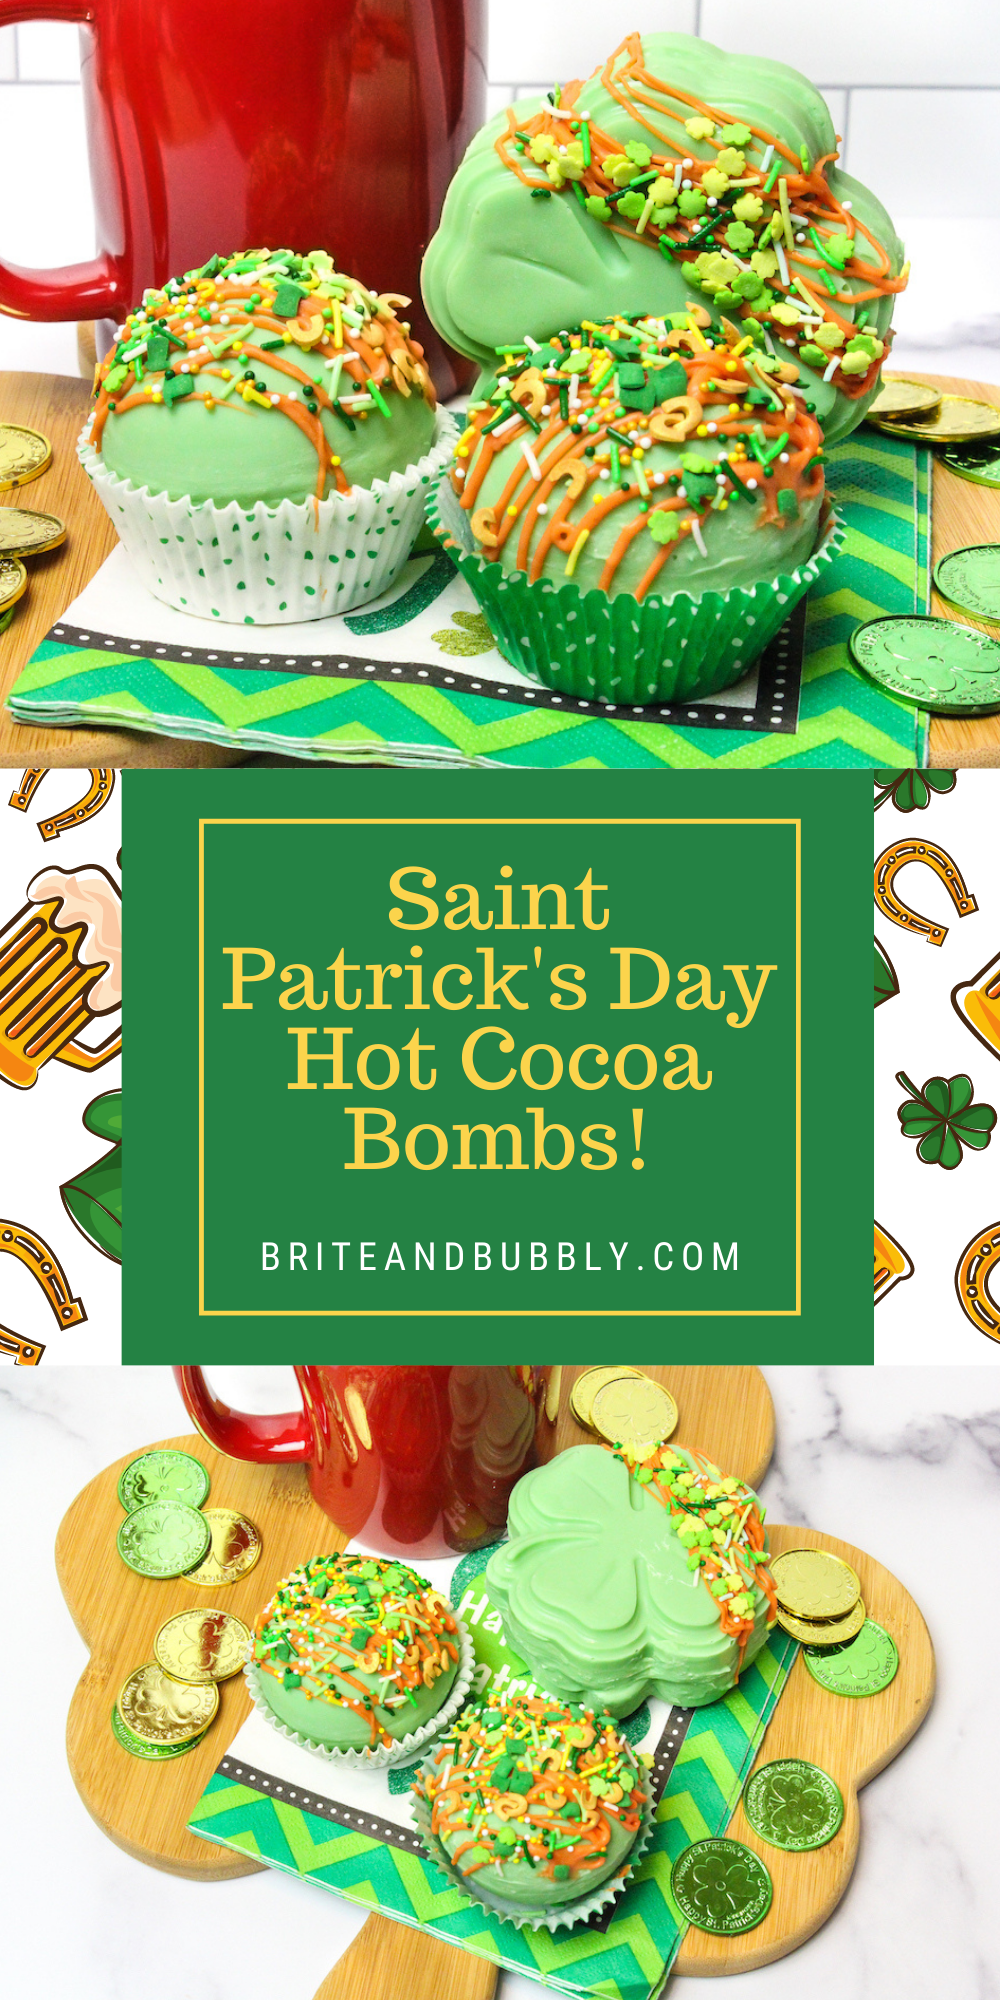 Pinterest Long Image of Final Saint Patrick's Hot Cocoa Bombs